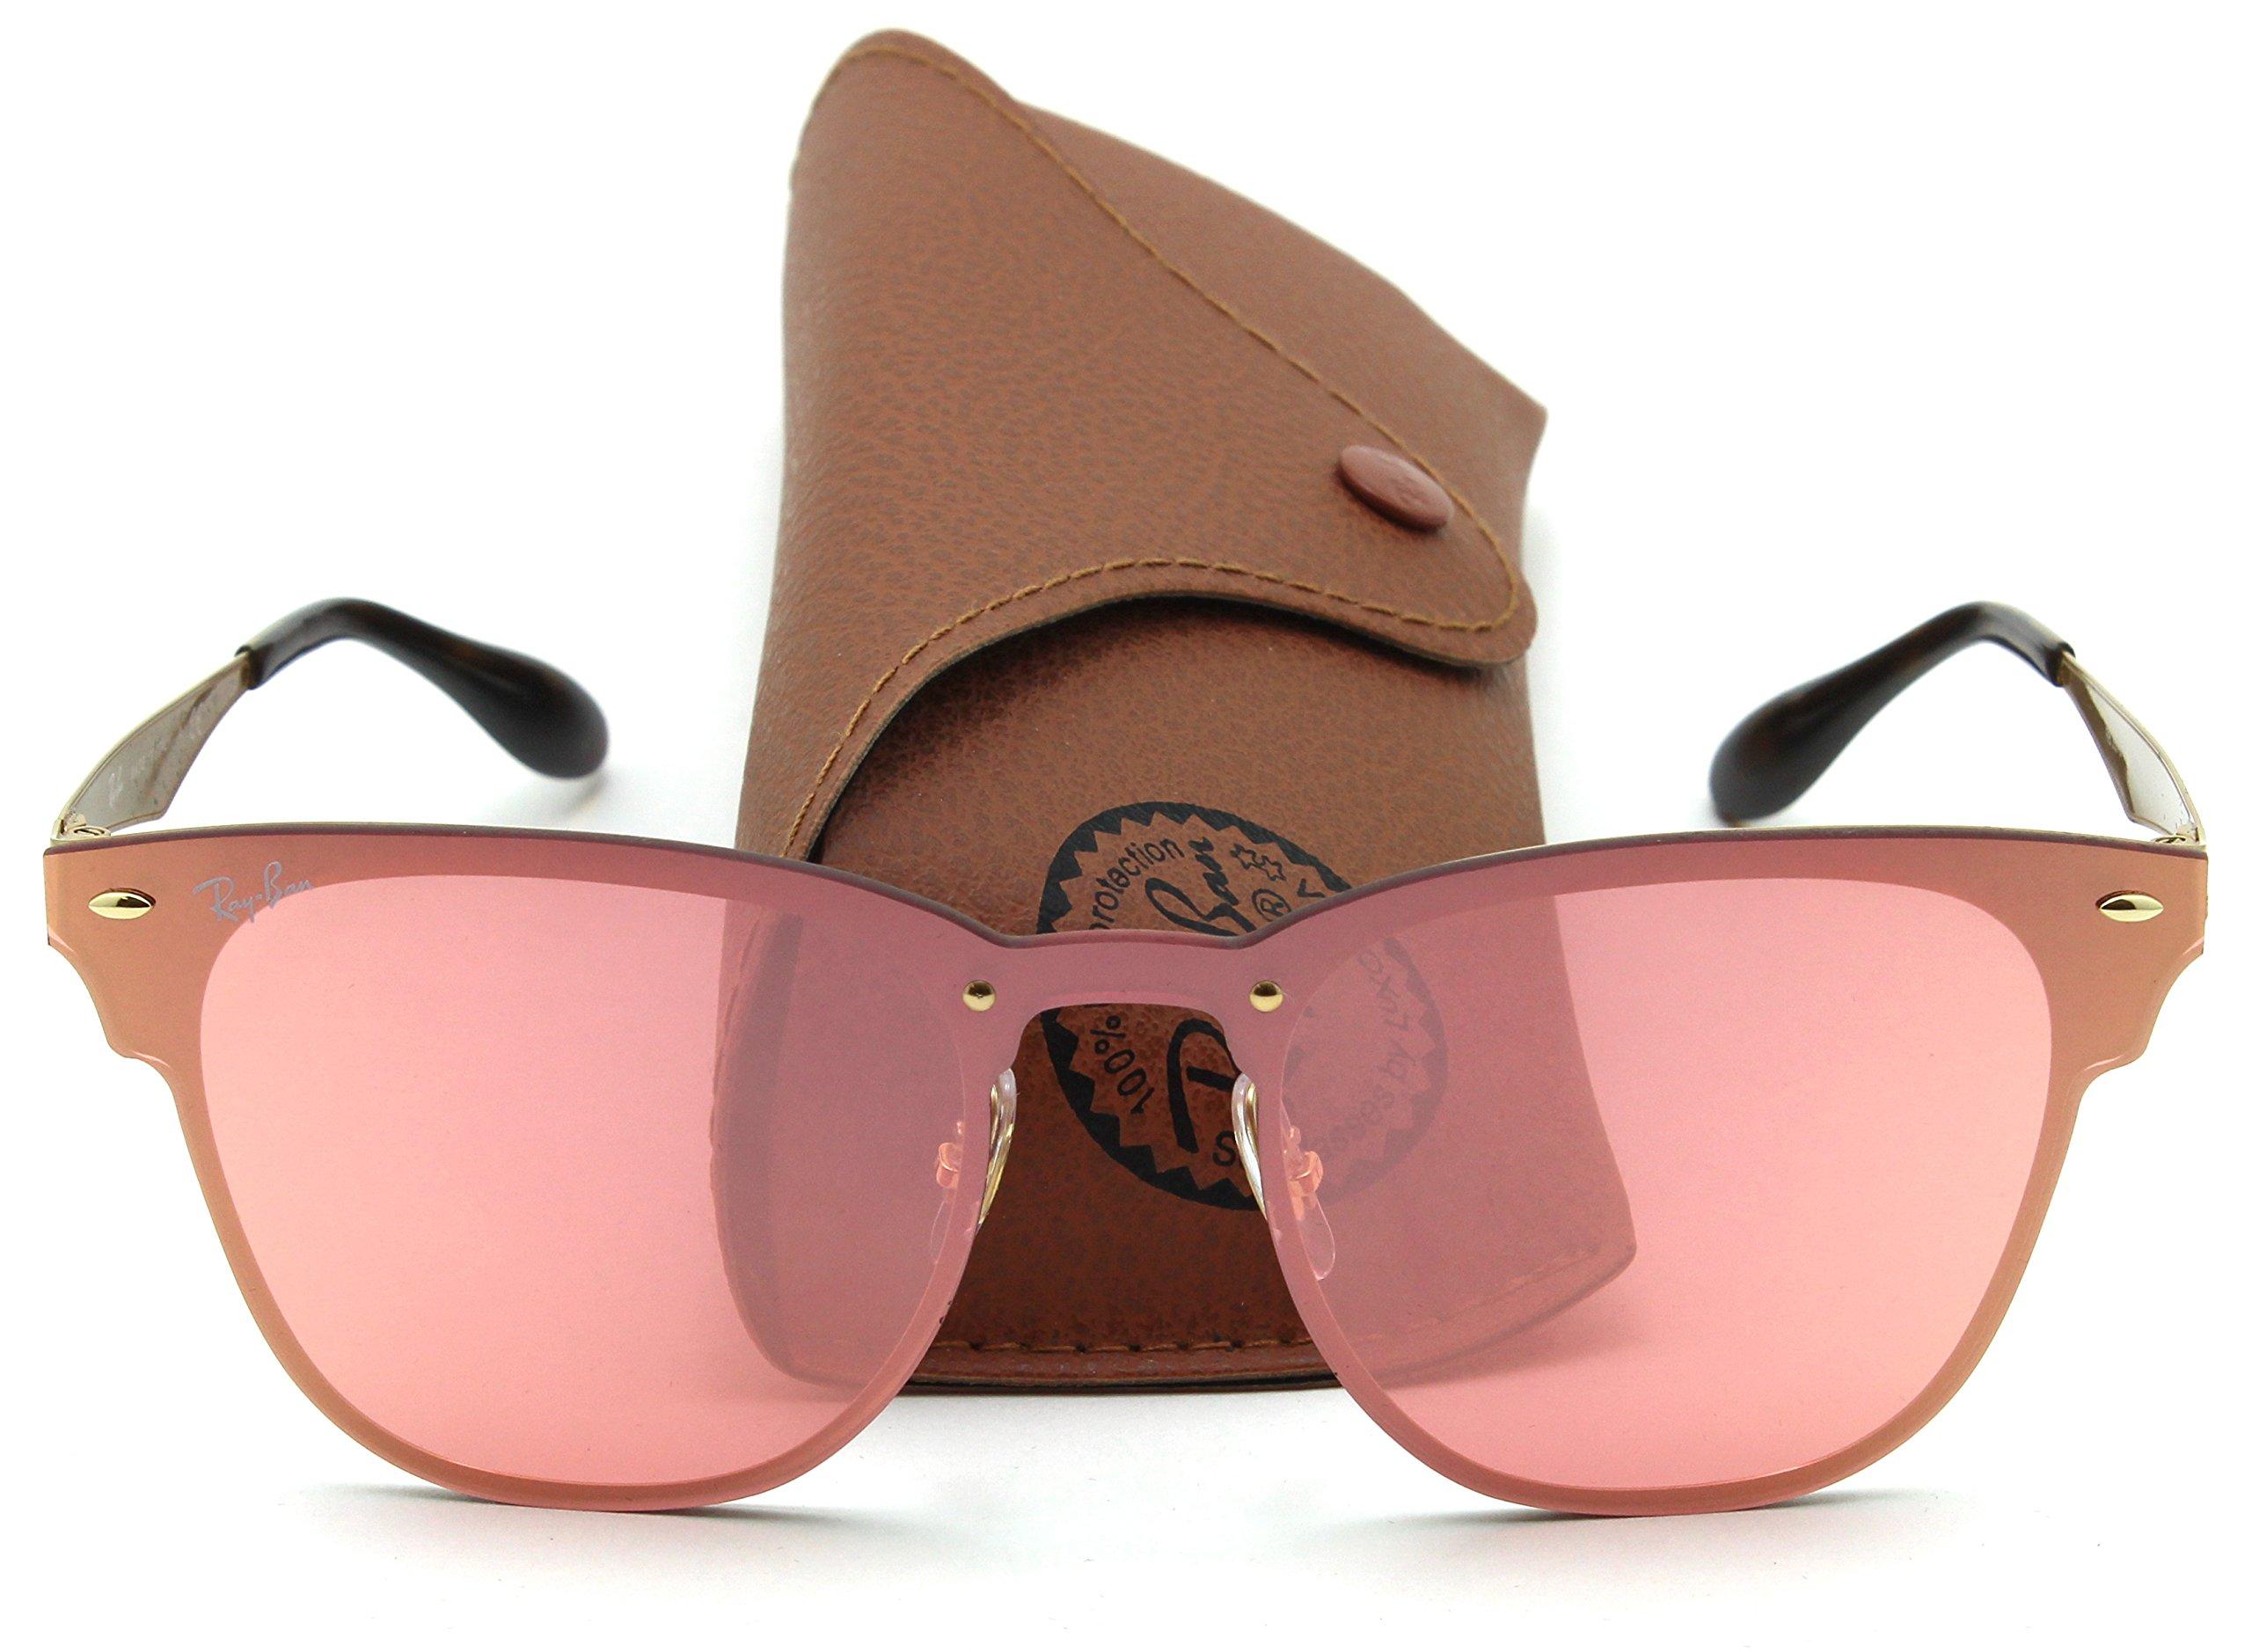 Ray-Ban RB3576N BLAZE CLUBMASTER Sunglasses 043/E4, 41mm